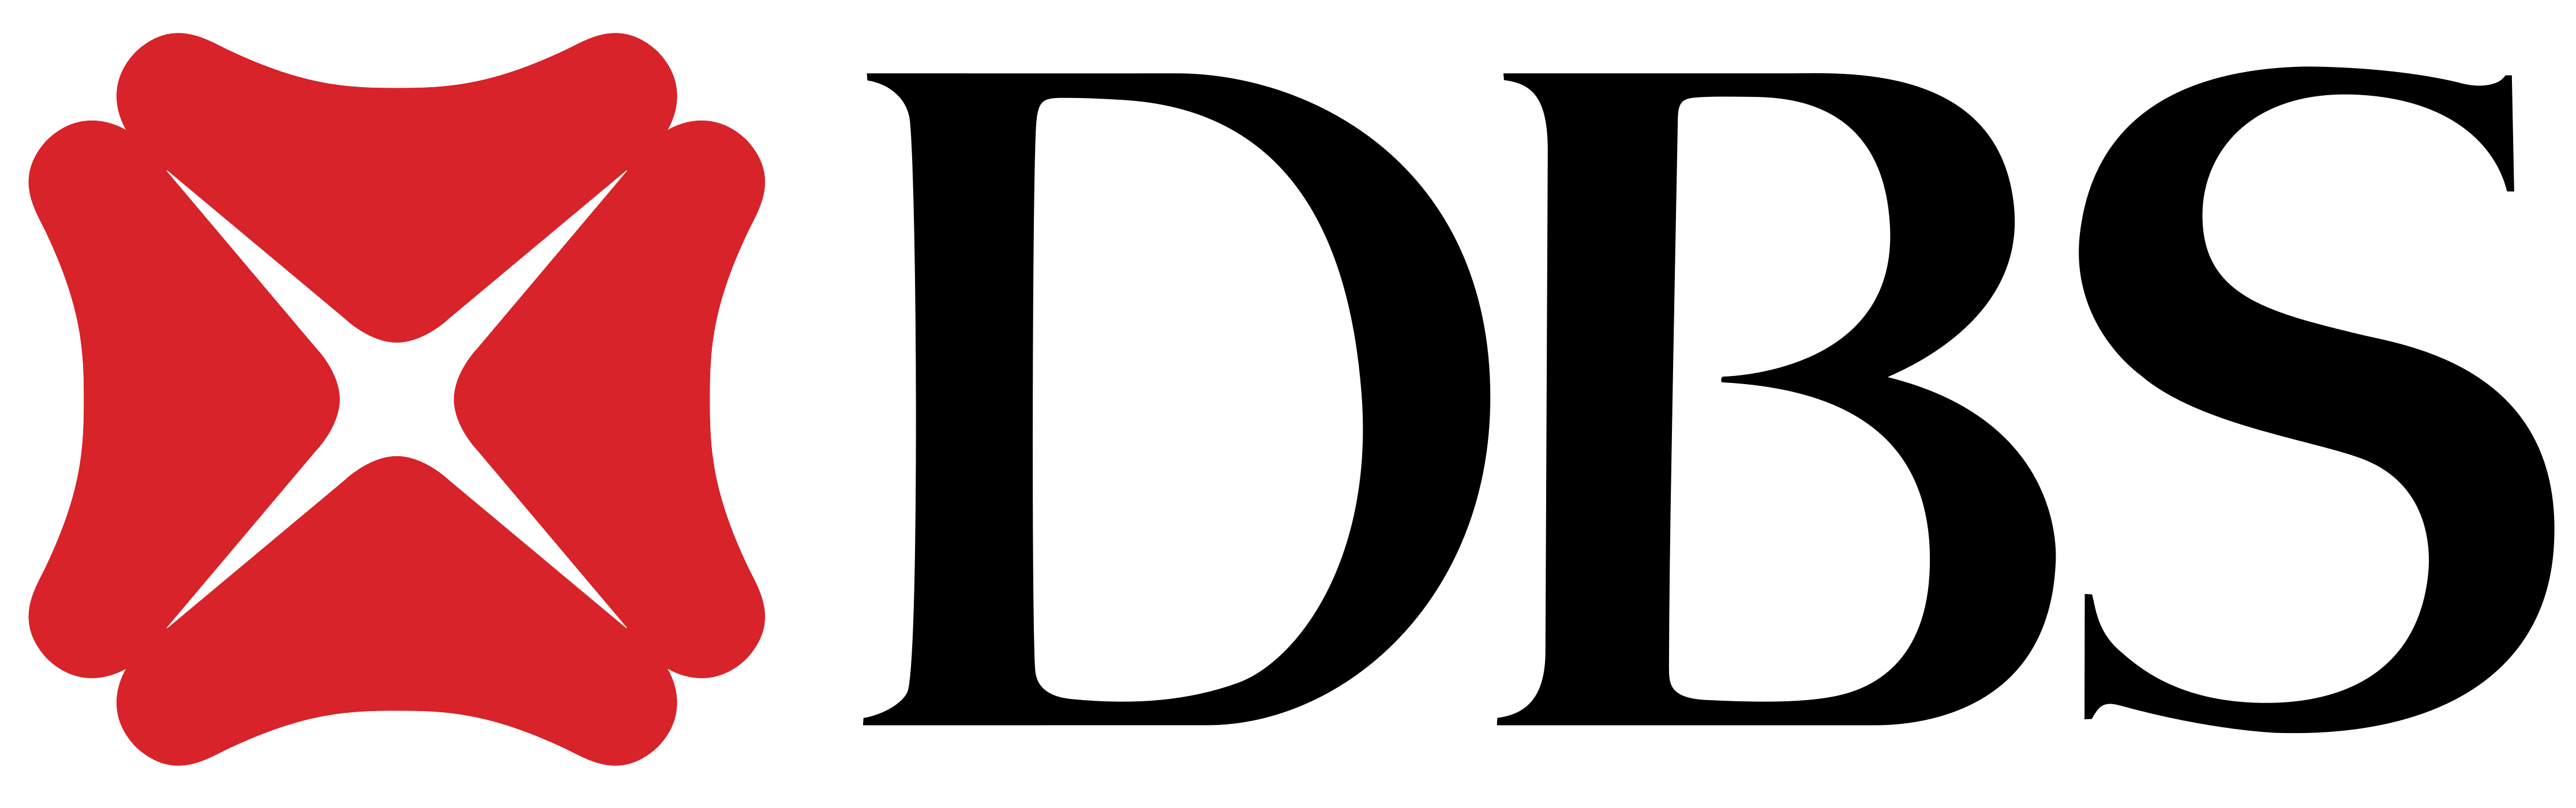 Logo Dbs PNG - 34275